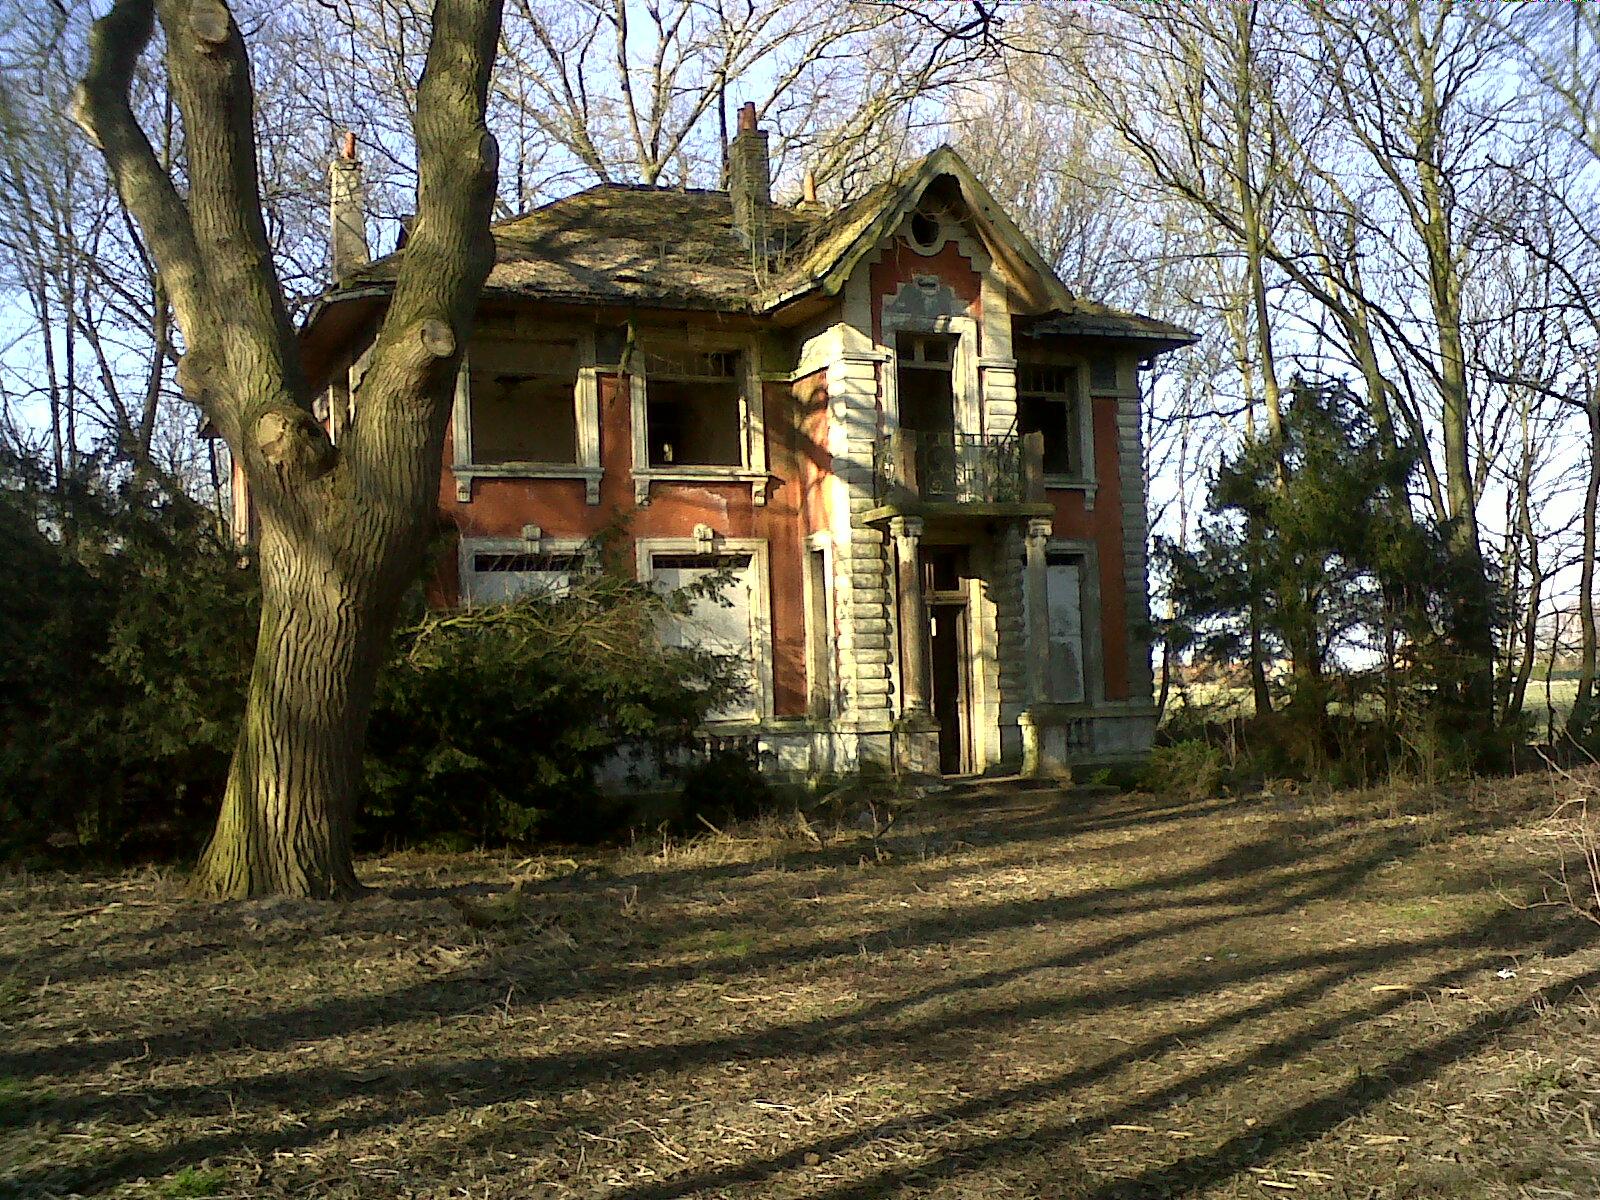 maison hantee wervicq sud